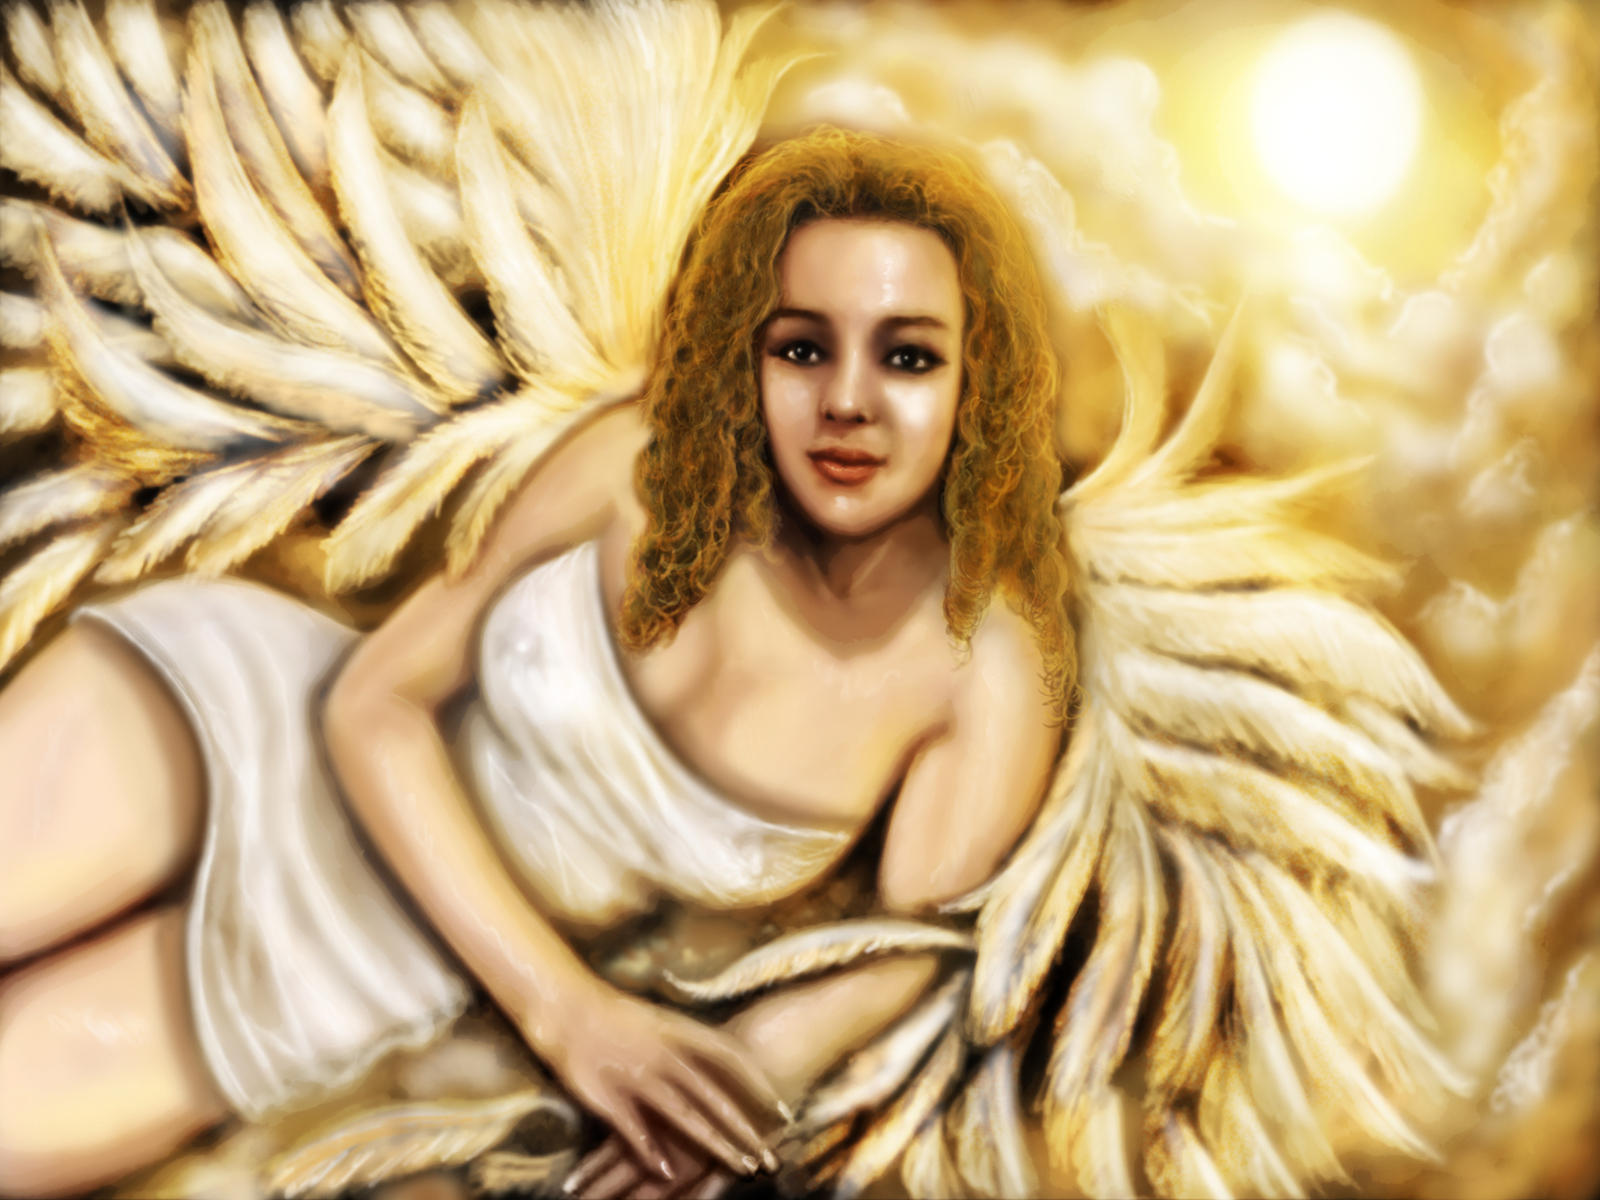 Sara angel of light by ScriptFx on DeviantArt